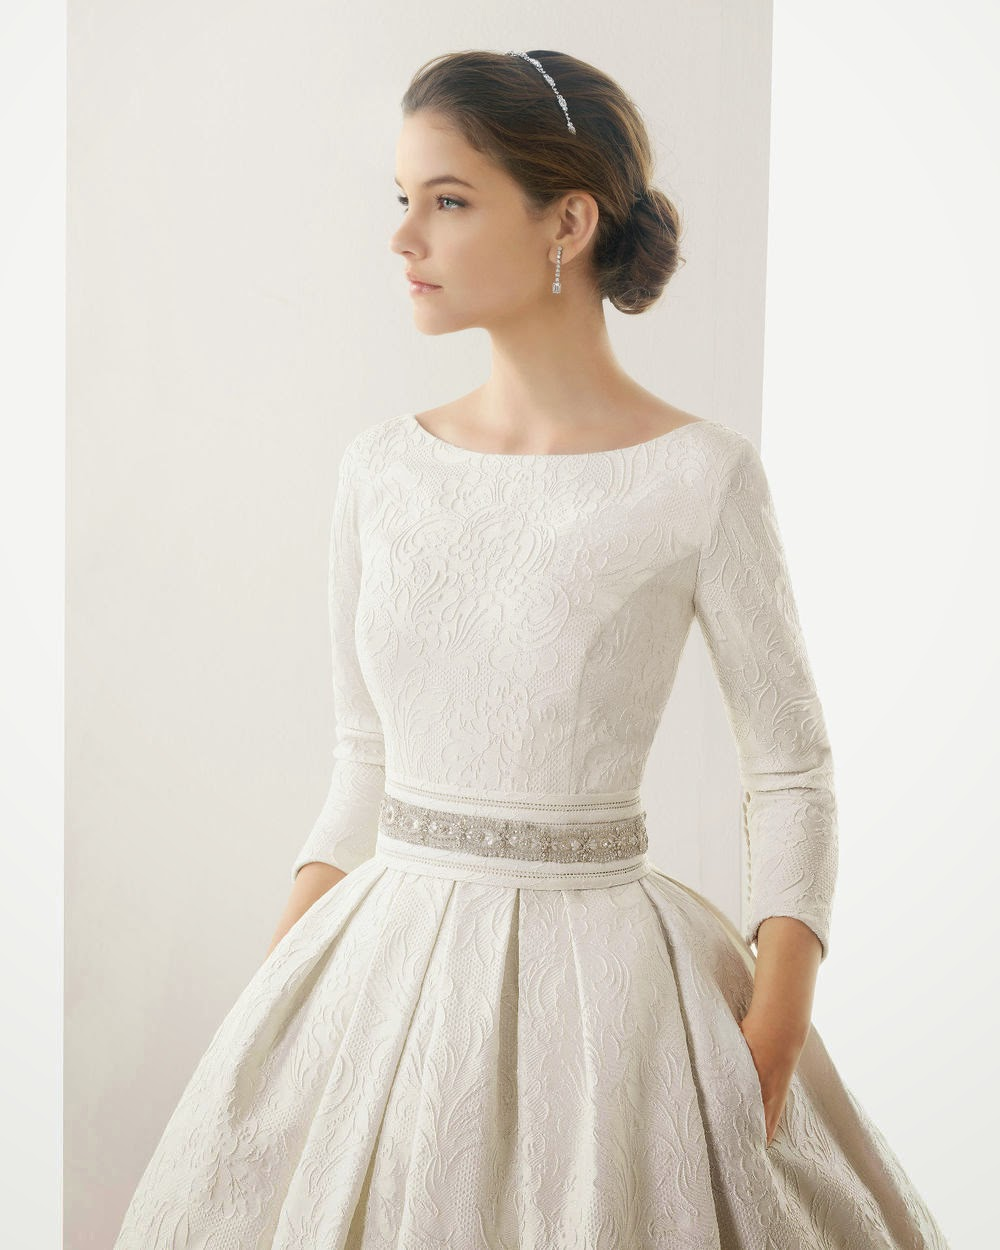 brides & bridesmaids fashion: Those style wedding dresses ...